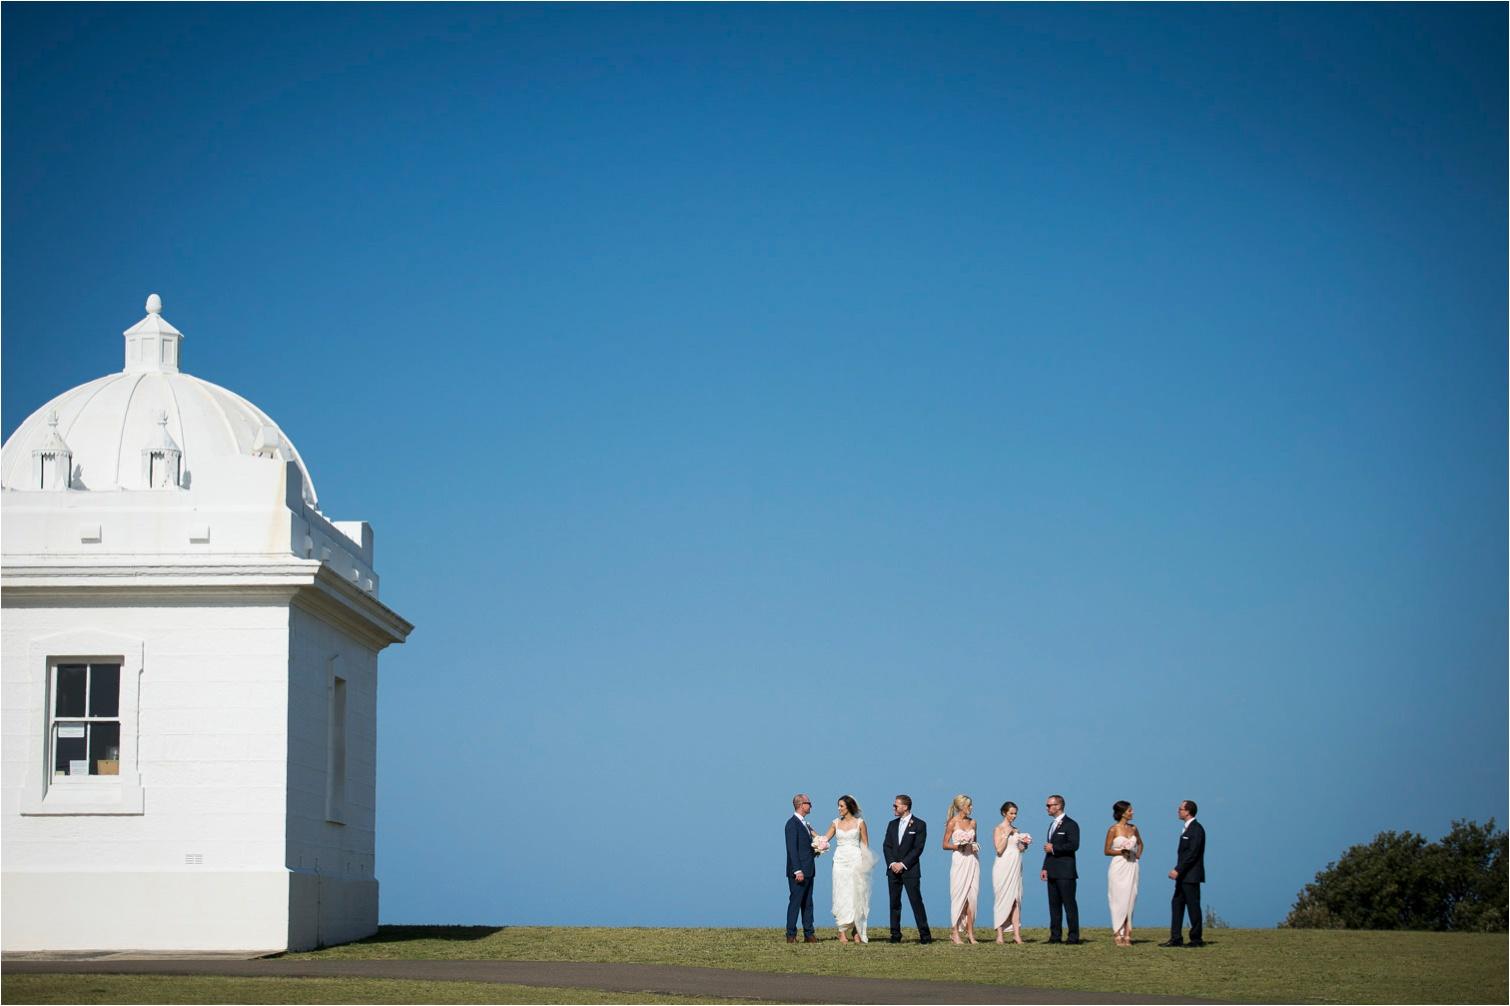 Nicole&Carlie_Watsons_Bay_Hotel_Wedding_by_Gold_Coast_Photographers-The_Follans25.jpg